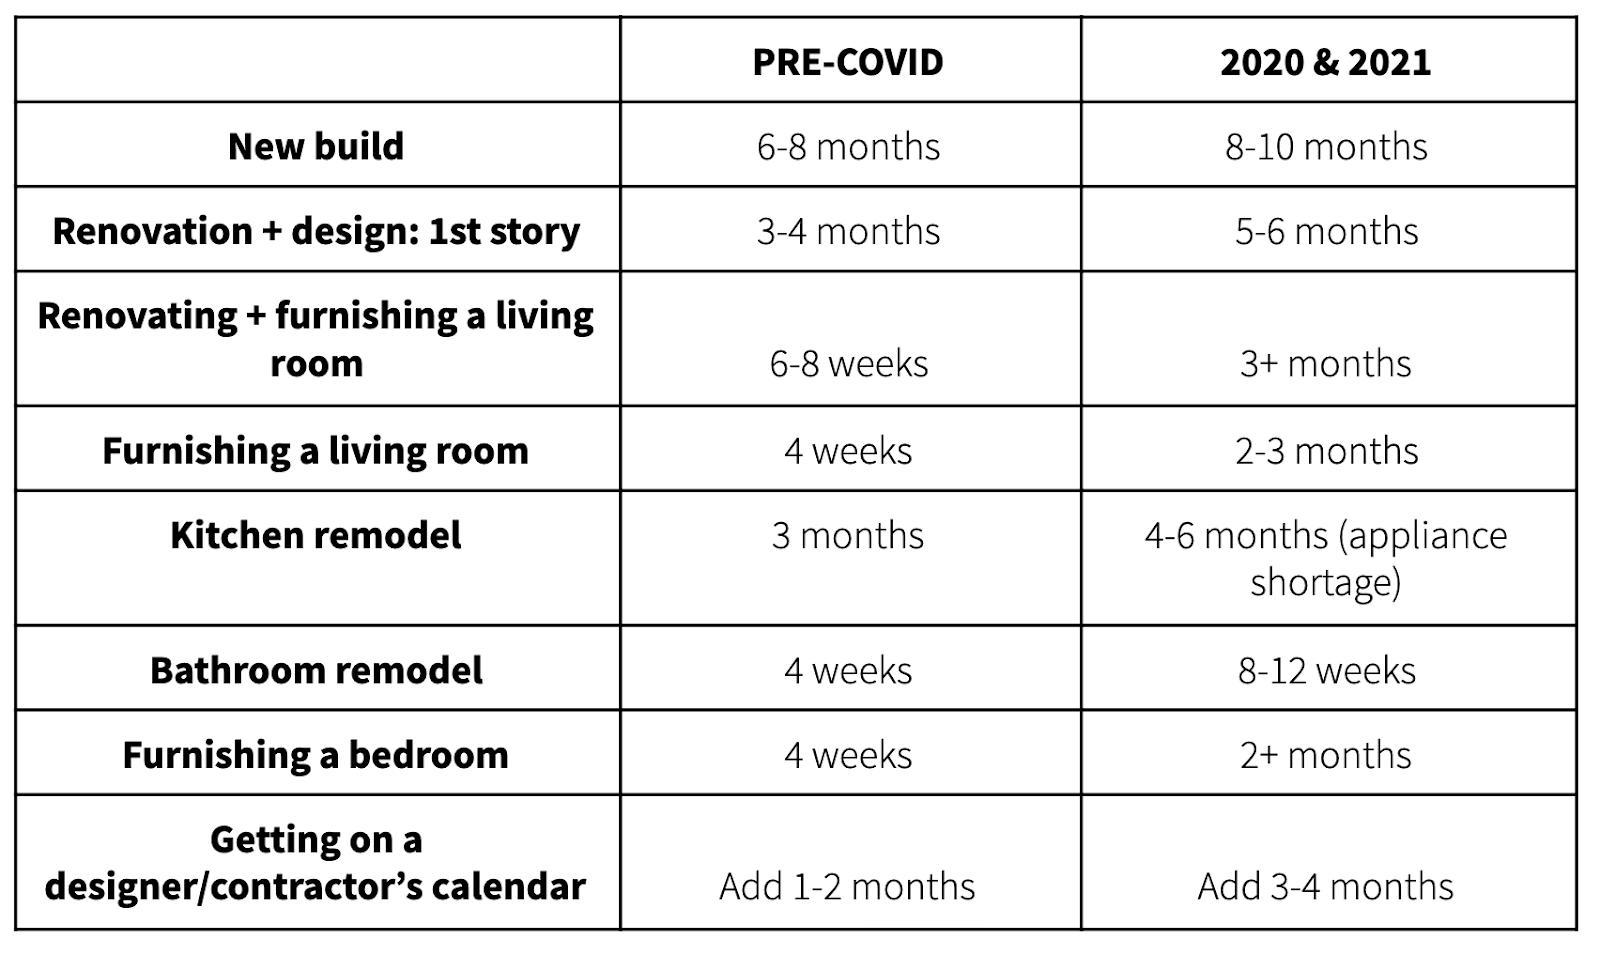 table of renovation timeline pre-covid vs. 2020 and 2021 in lebanon, tn